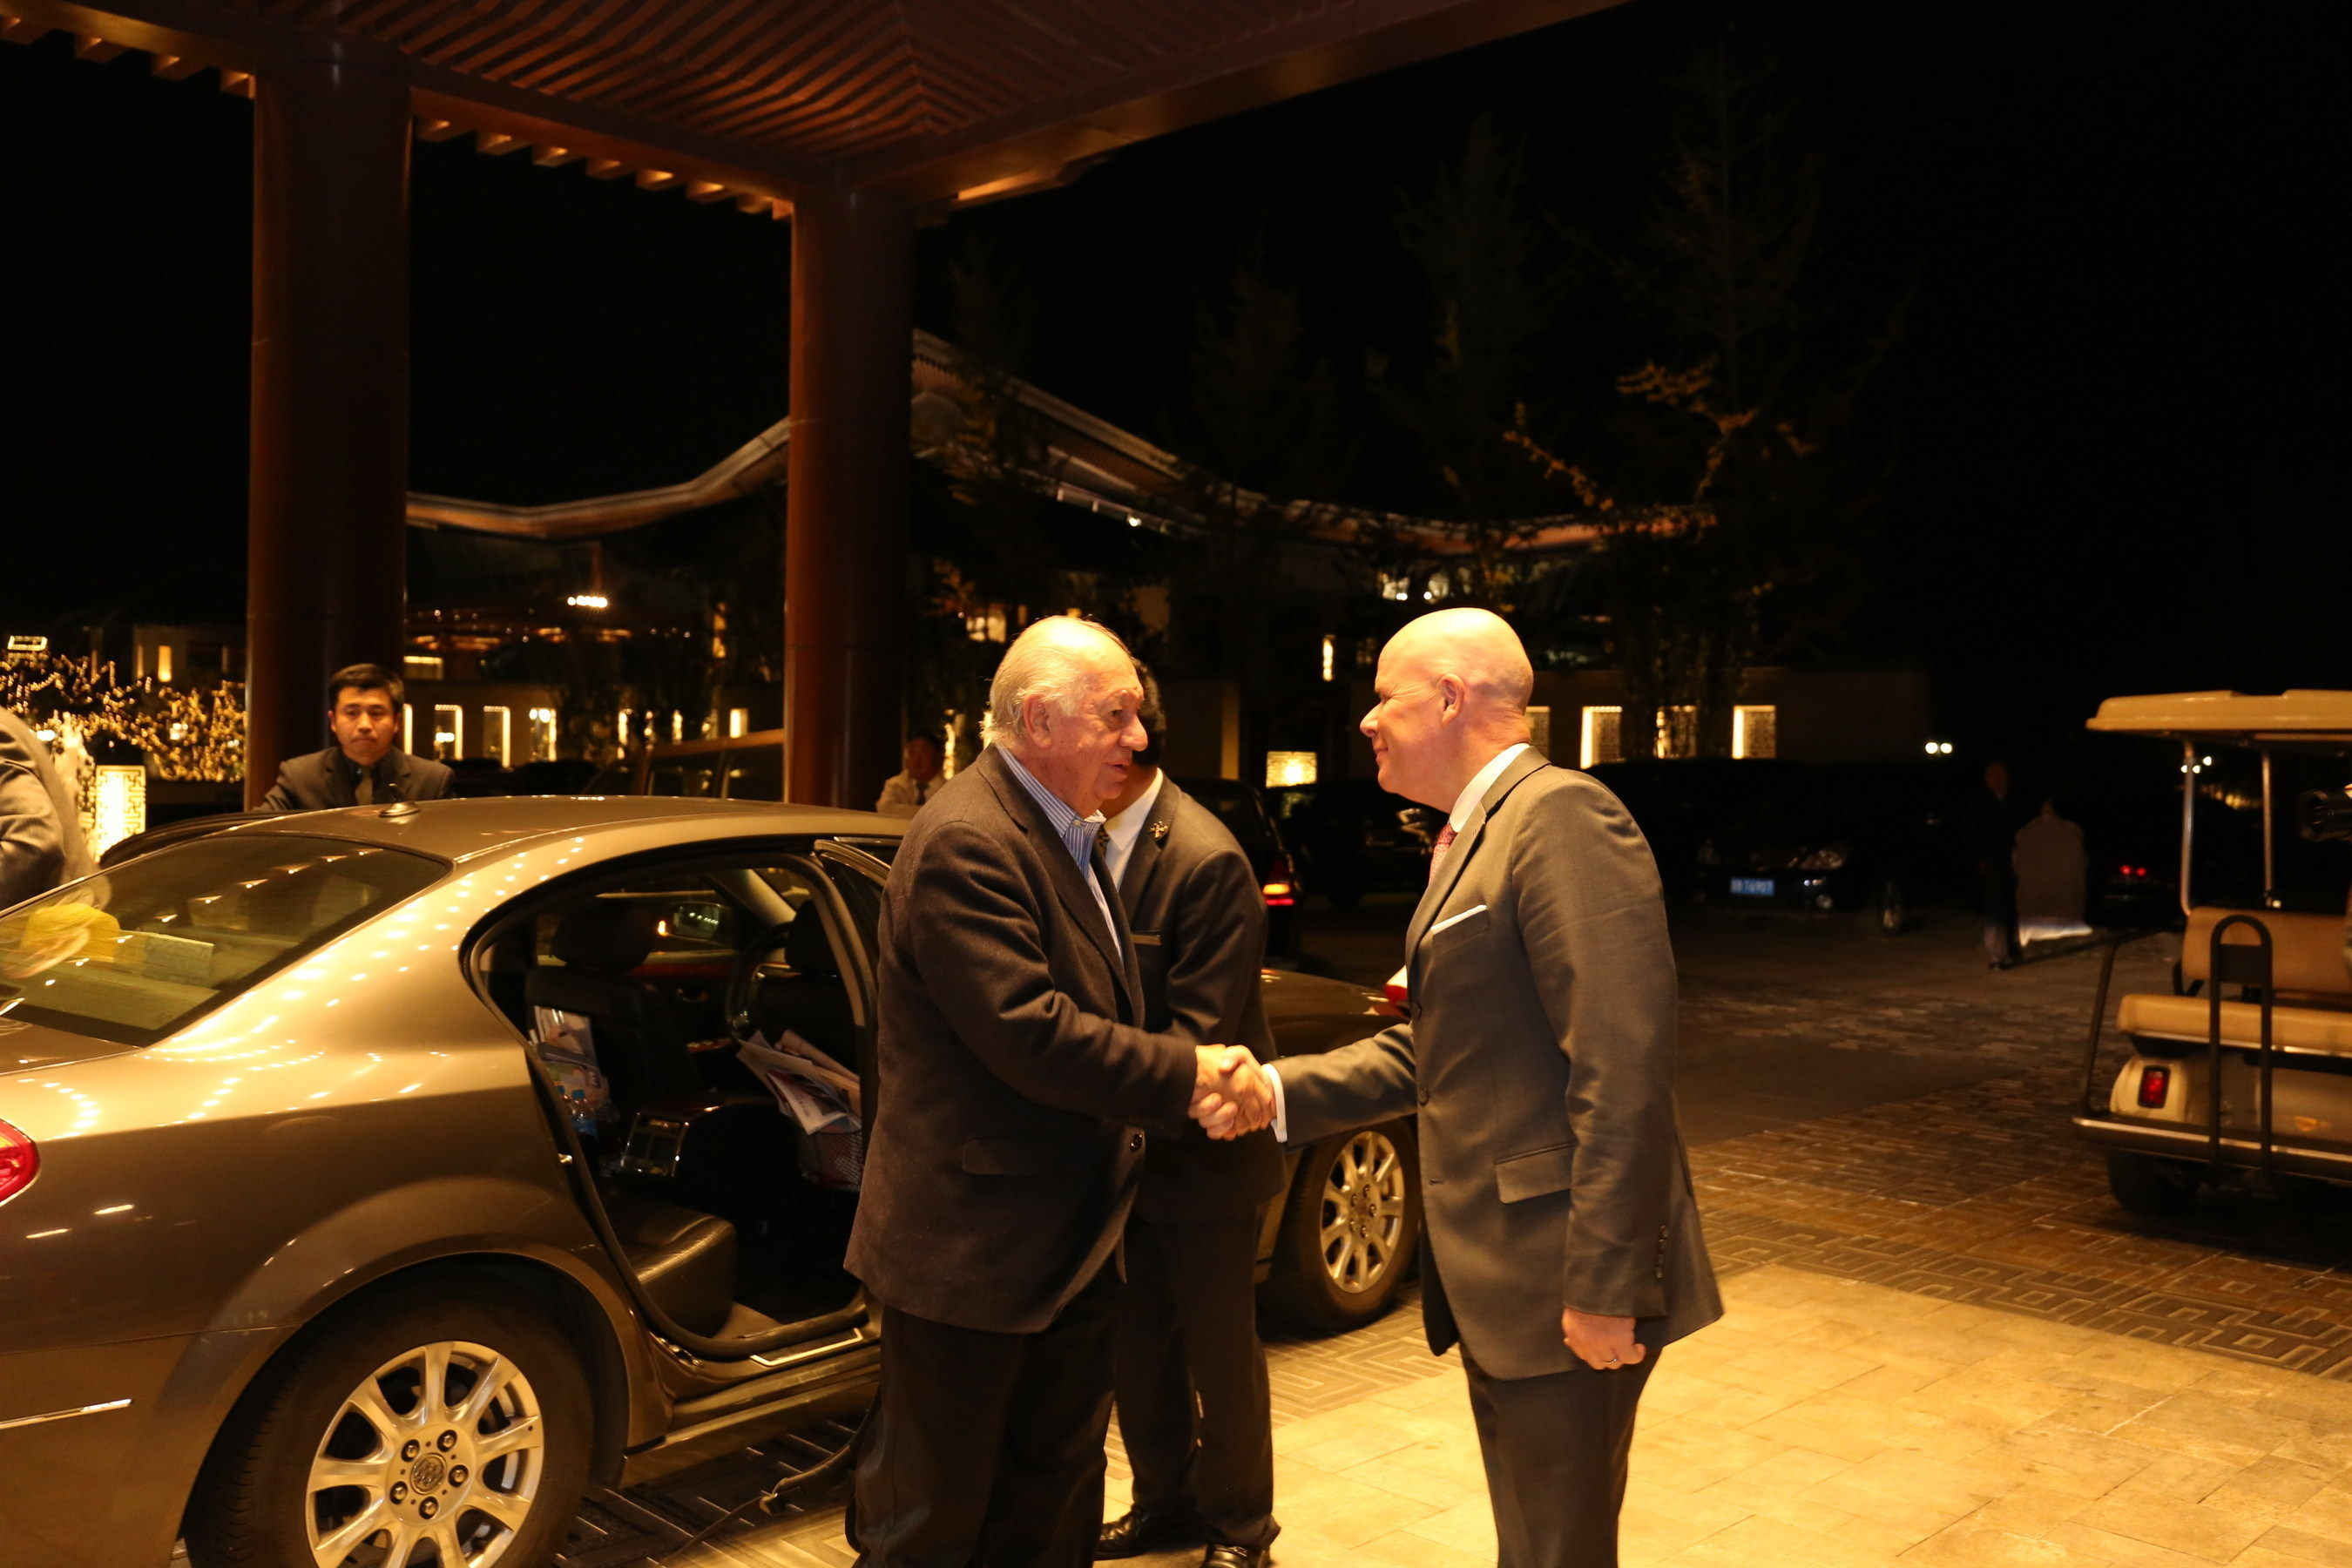 Former President of Chile Ricardo Lagos welcomed by Brice Pean, GM of Sunrise Kempinski Hotel, Beijing & Yanqi Island